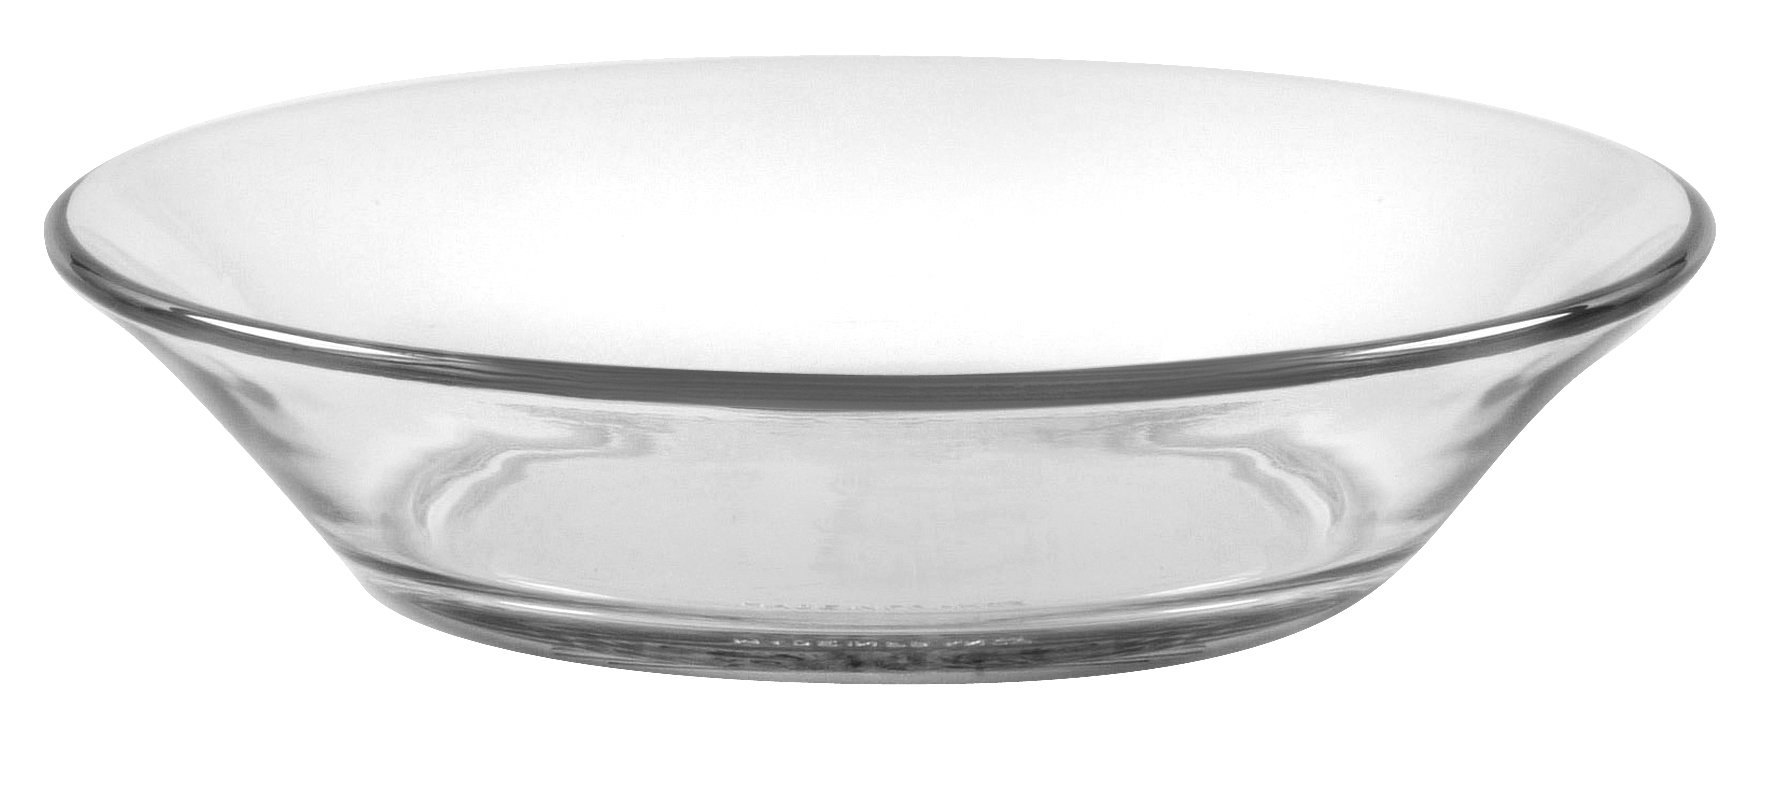 Duralex - Lys Clear Calotte Plate 17,5 cm (6 7/8 in) Set Of 6